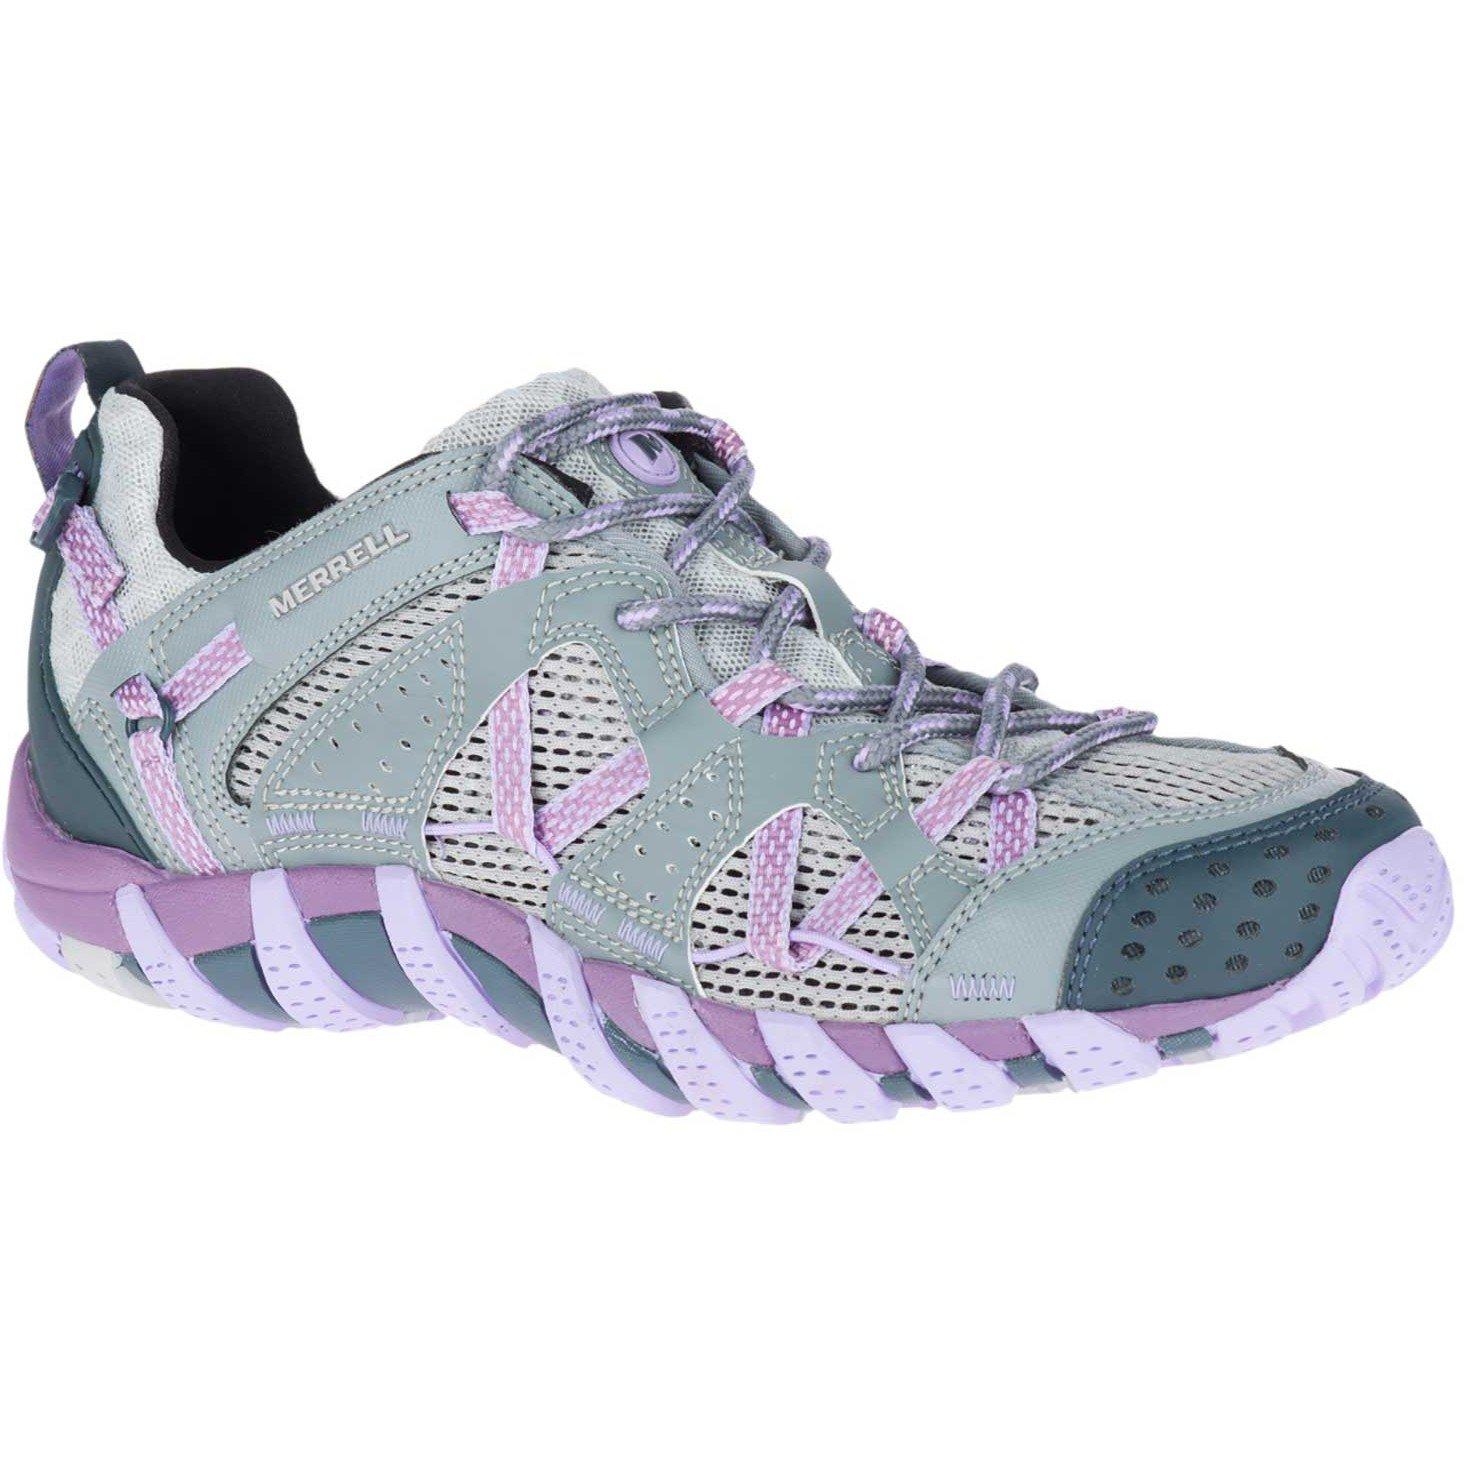 Merrell Waterpro Maipo Womens Watersport Shoes 8 B(M) US Women Purple Rose by Merrell